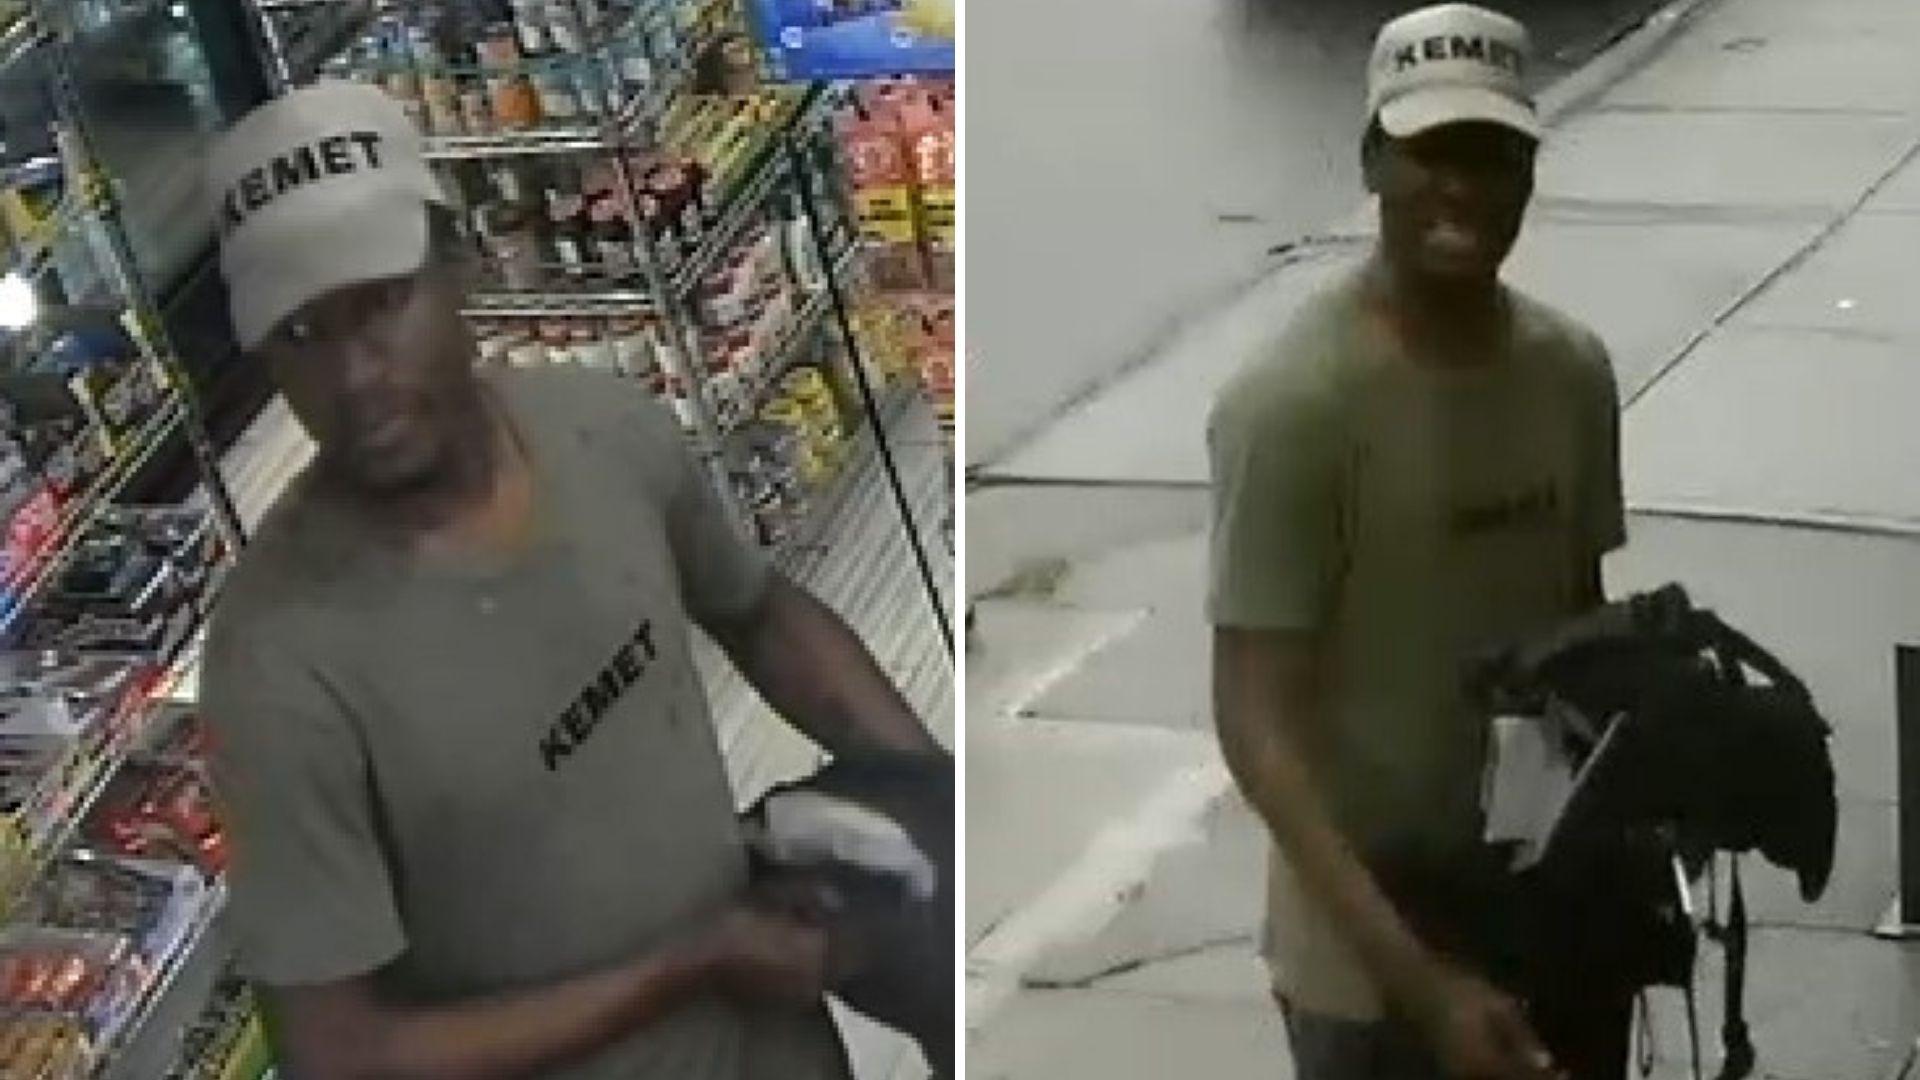 Man accused in Brooklyn subway attack